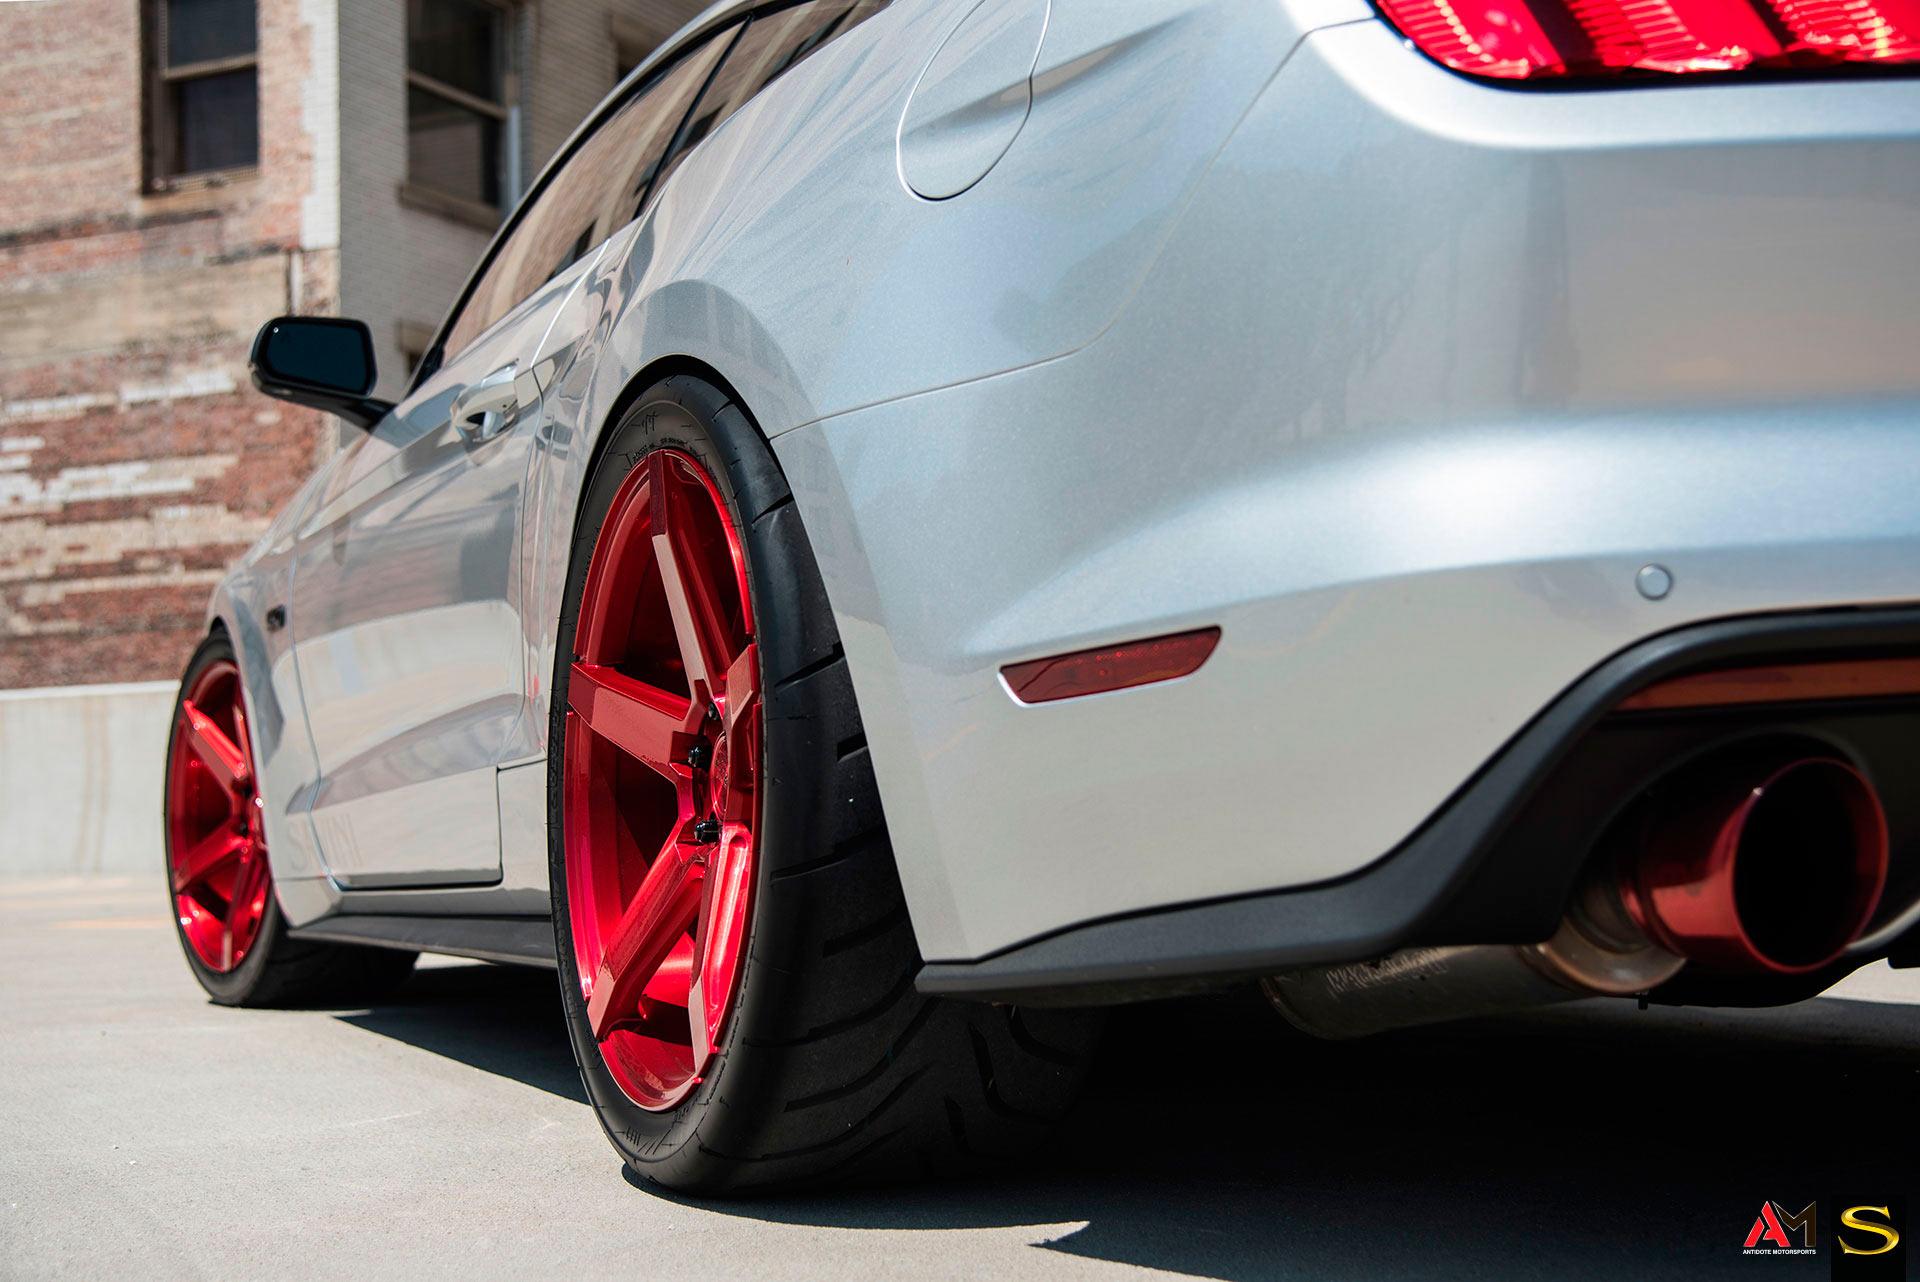 savini-wheels-black-di-forza-bm11-brushed-red-ford-mustang-gt-antidote6